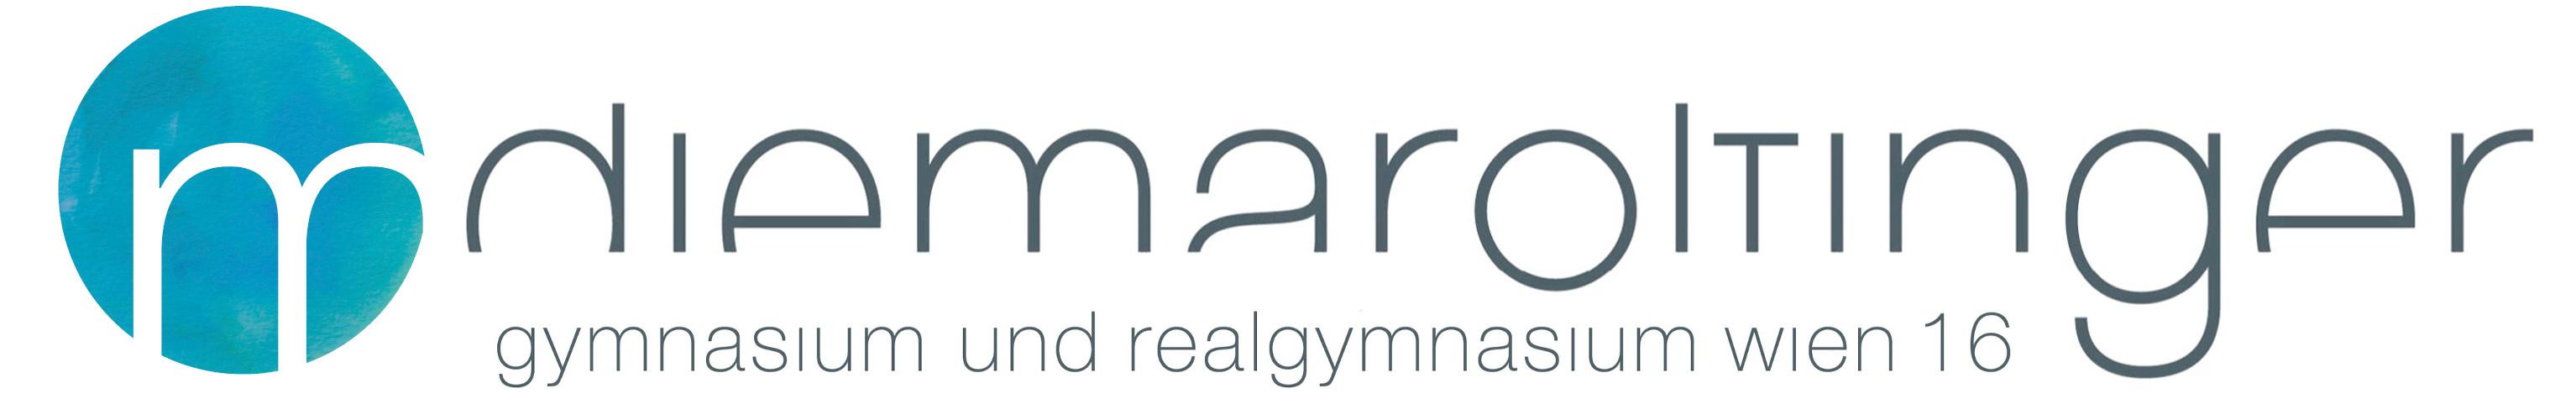 GRG 16 Logo